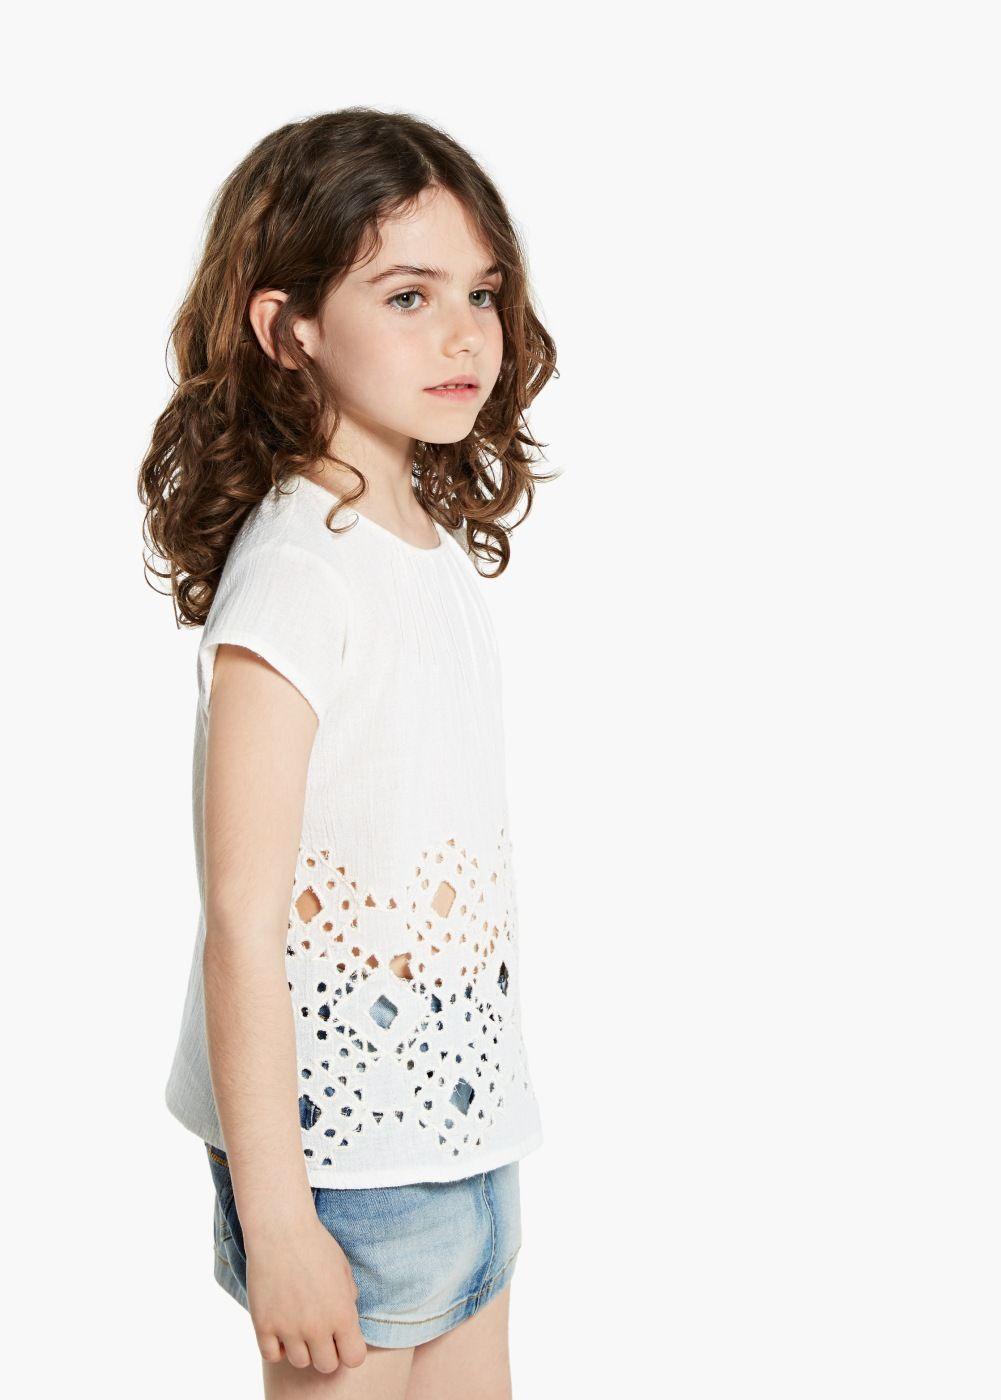 Blusa bordada textura